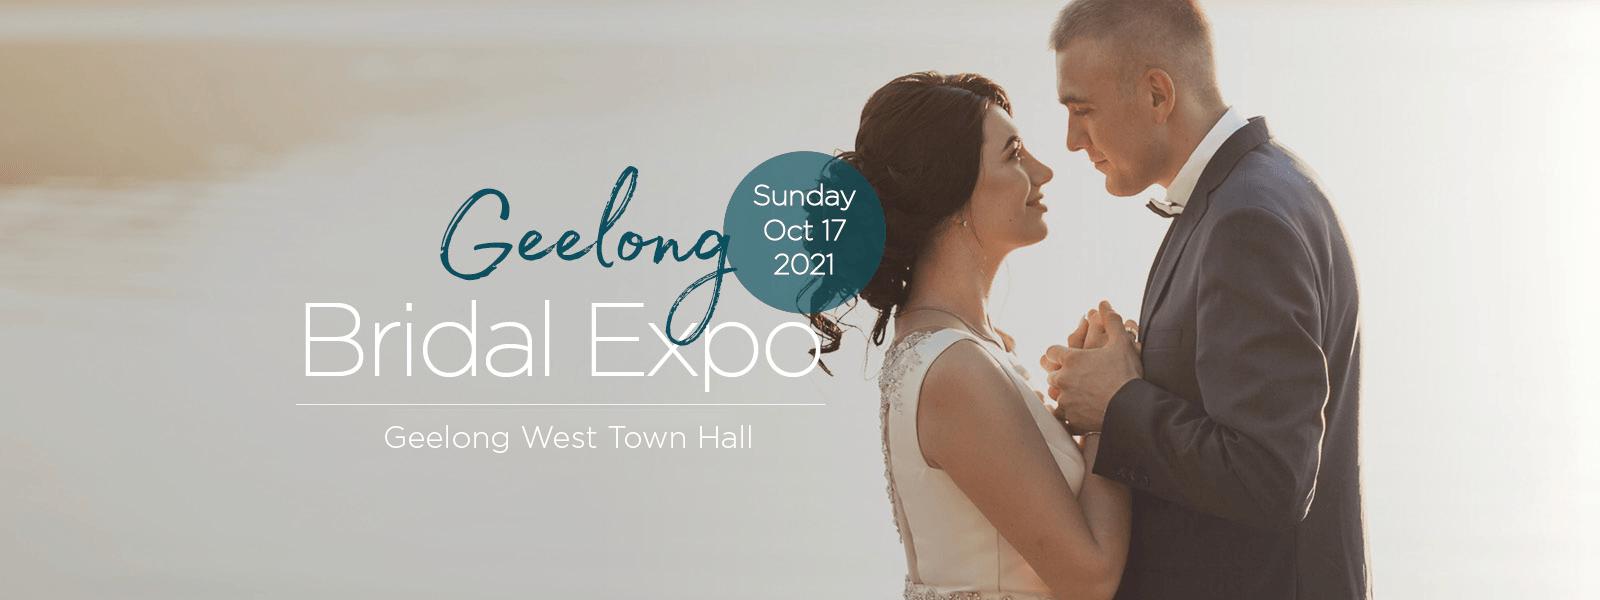 Geelong Bridal Expo 17 October 2021